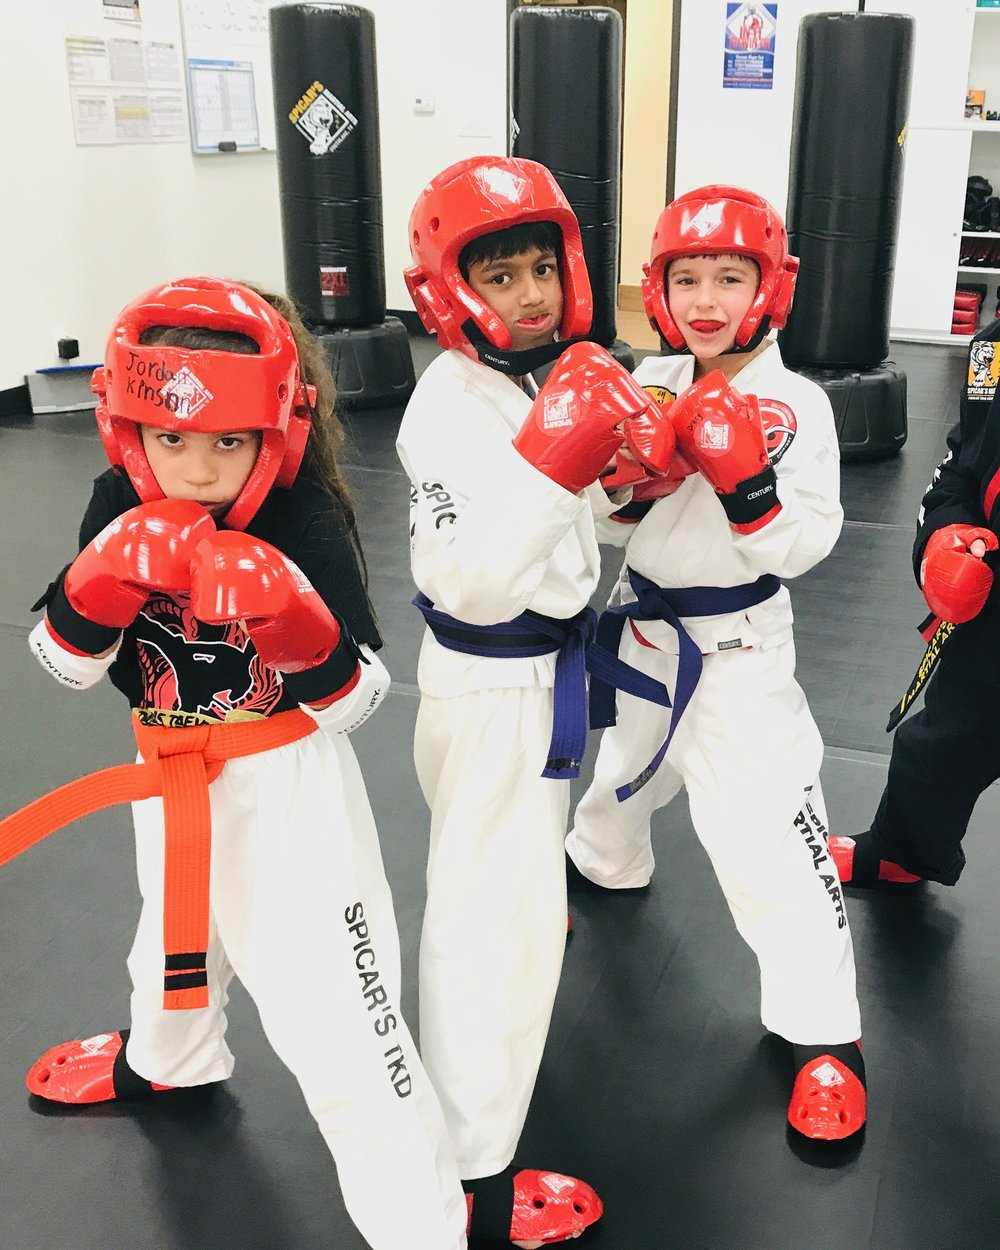 Southlake's martial arts students sparring at testing.